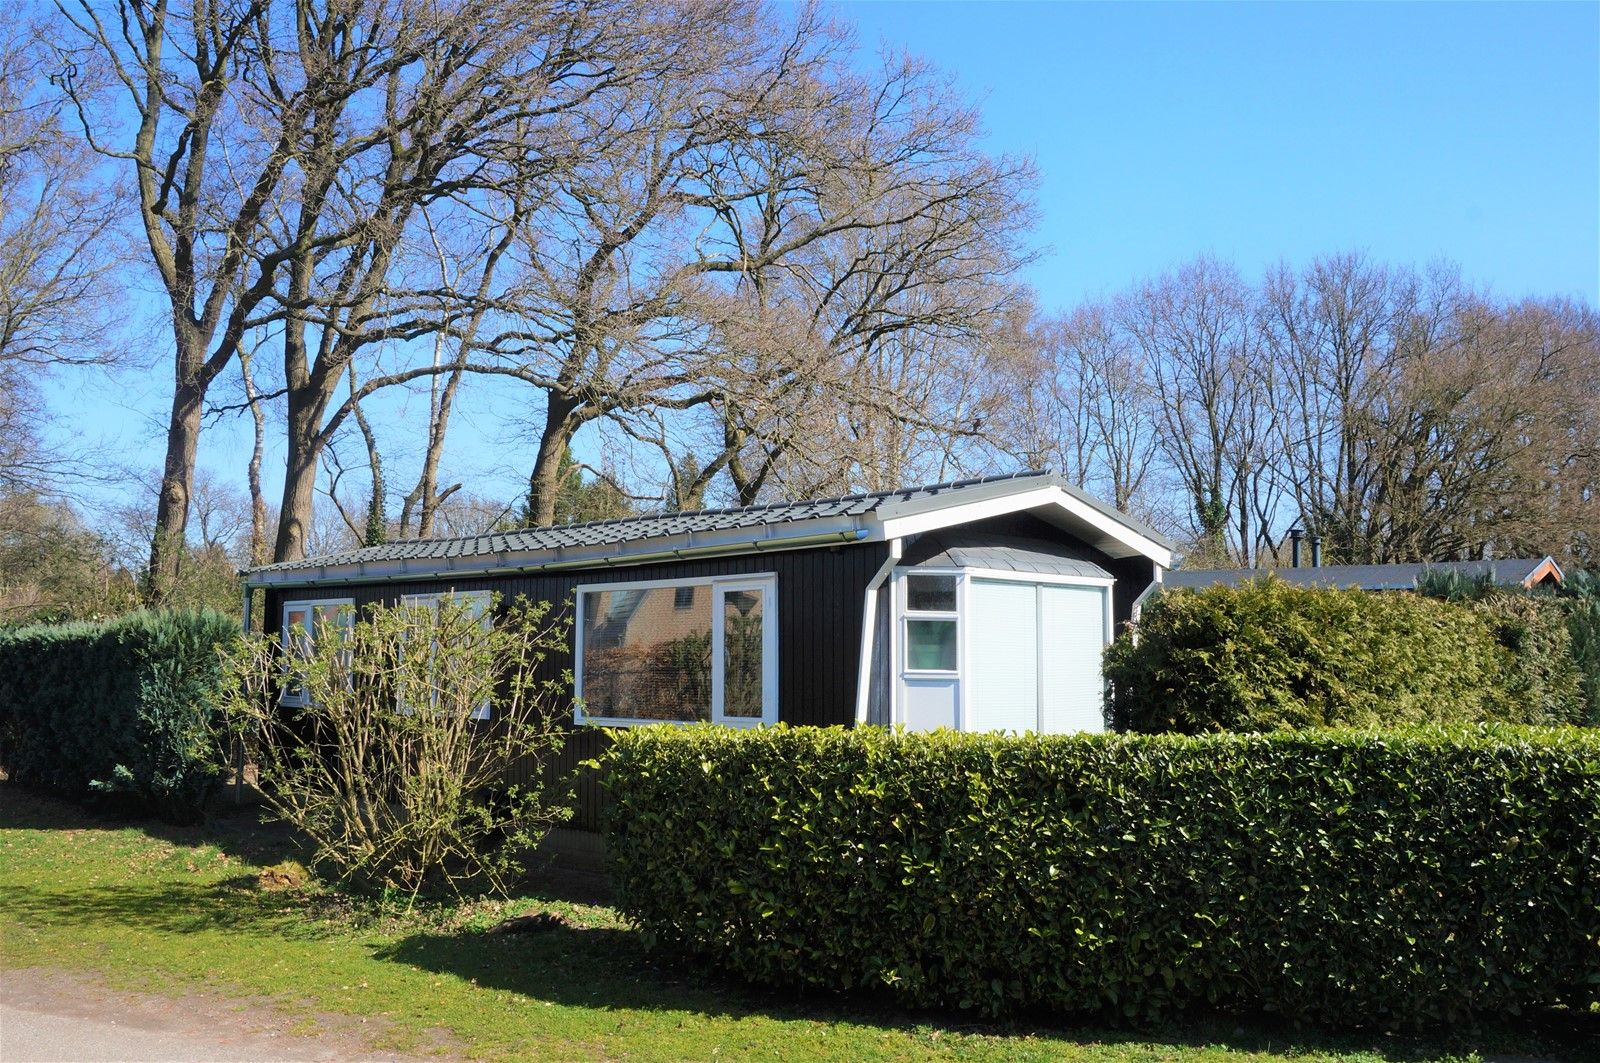 Harderwijkerweg 246-12, Ermelo